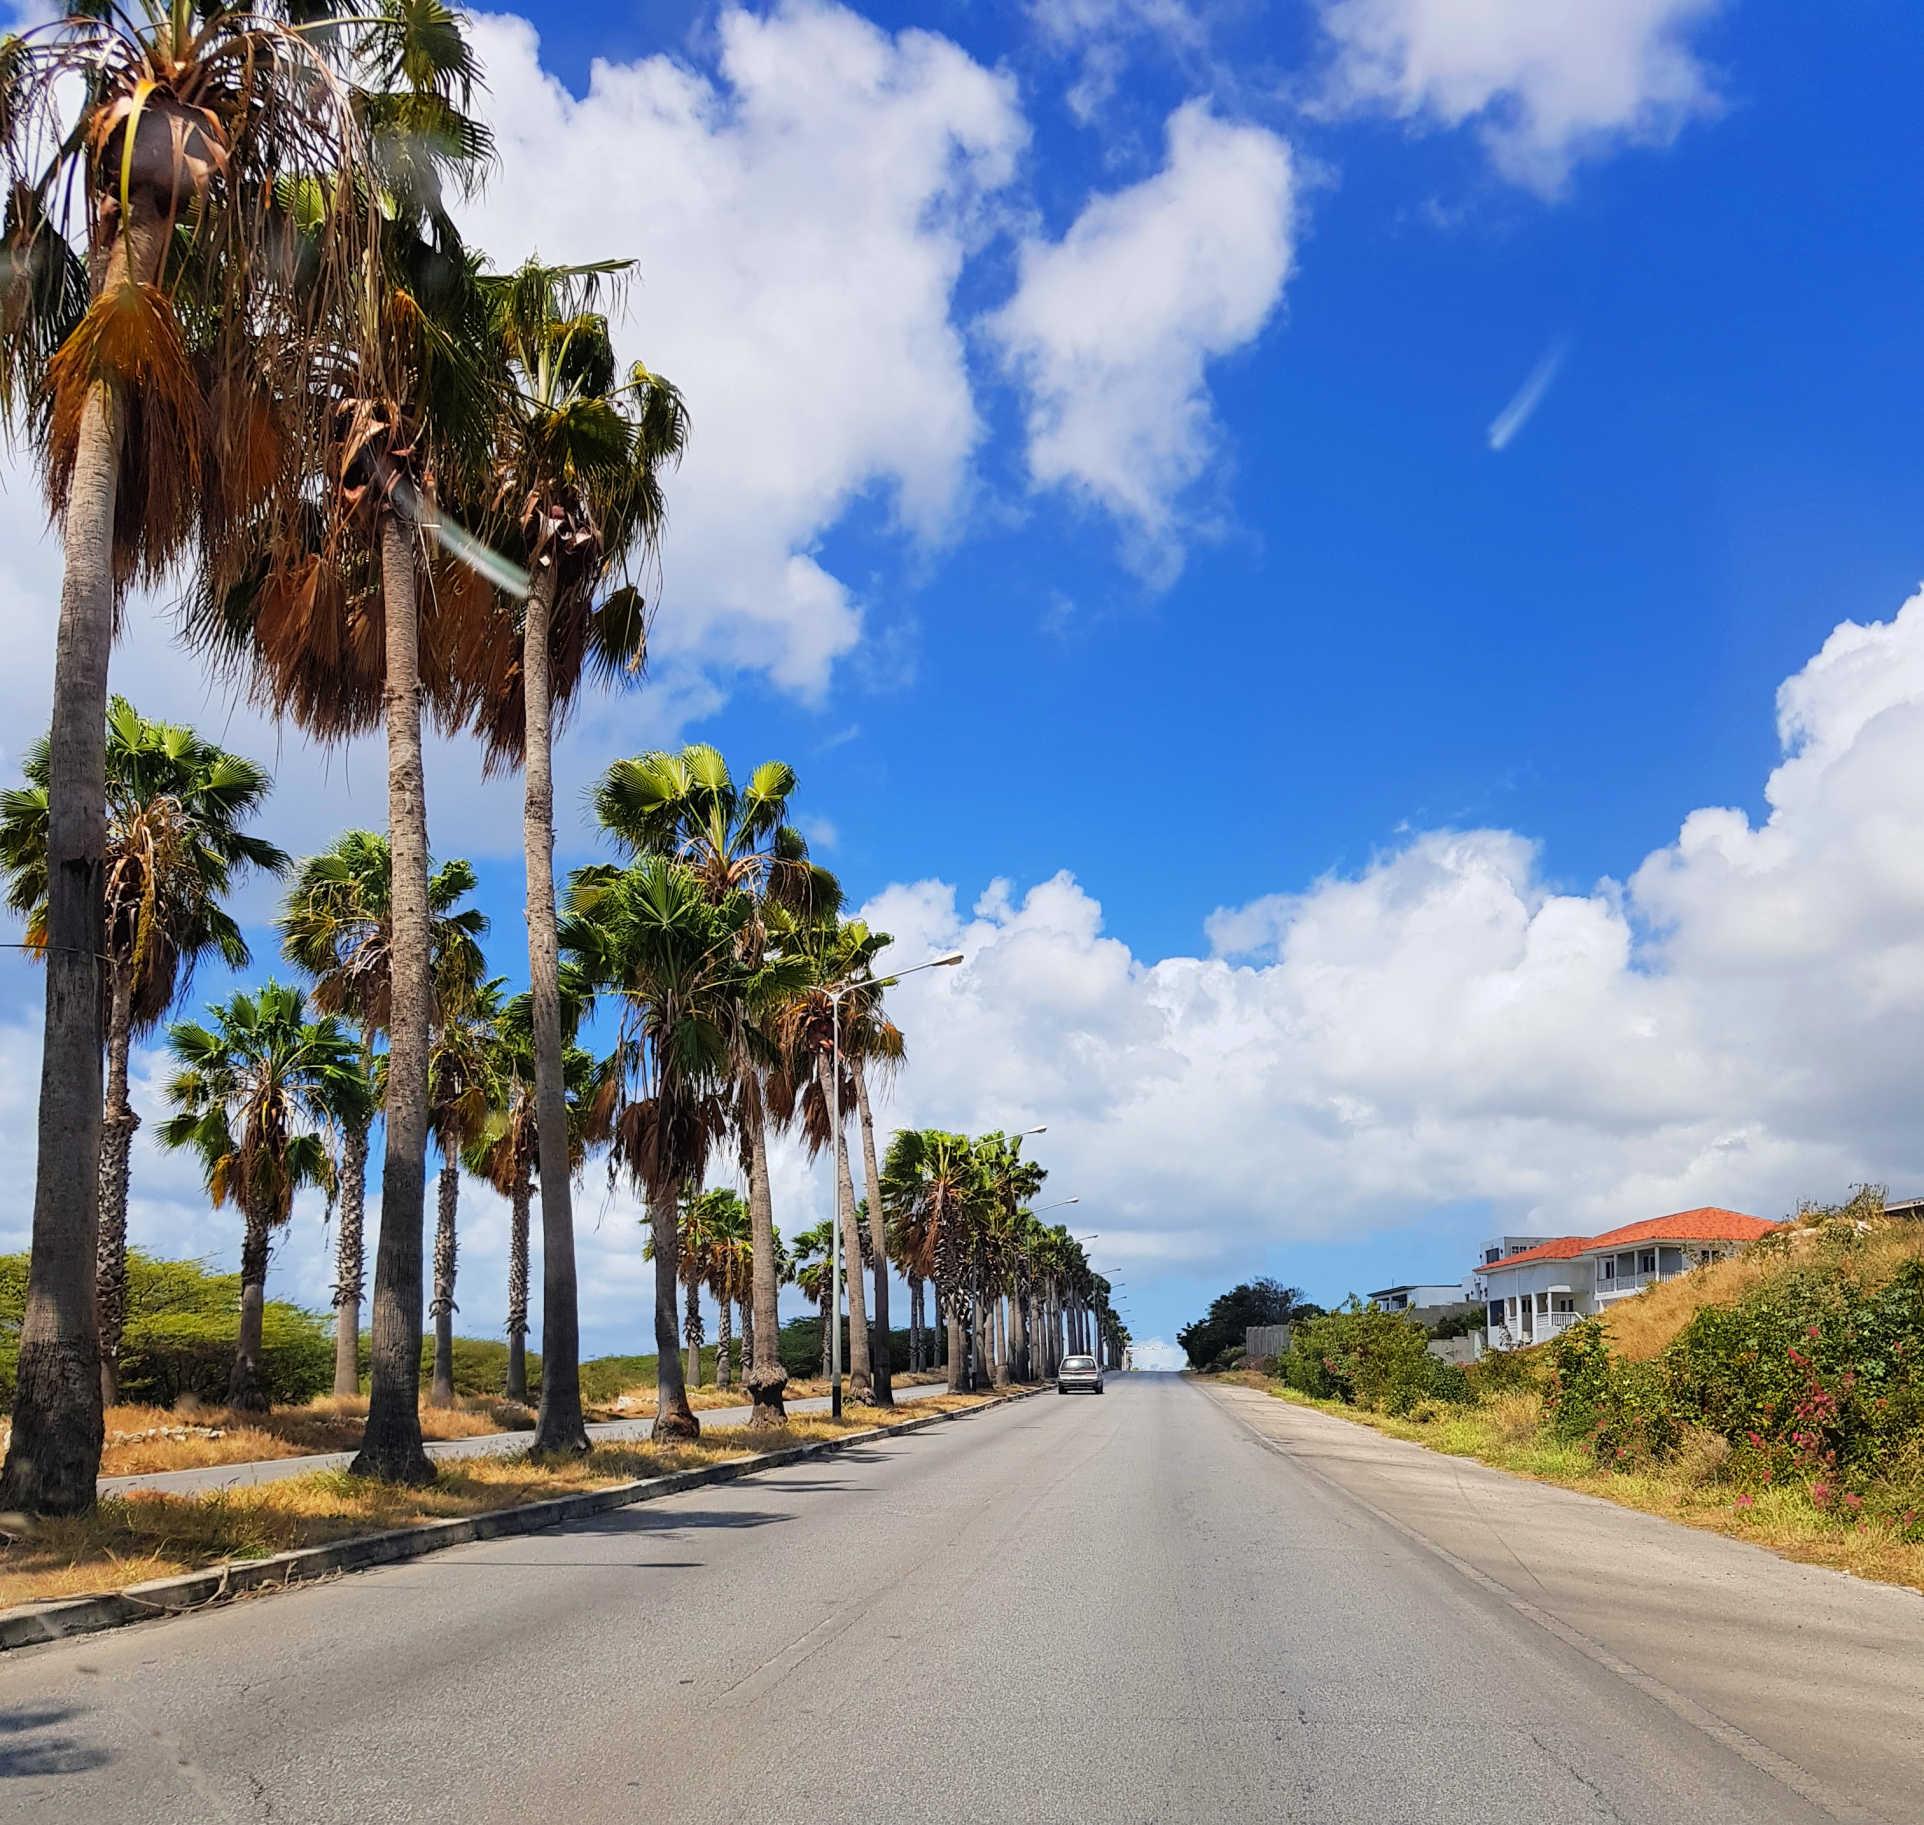 Huurauto Curacao